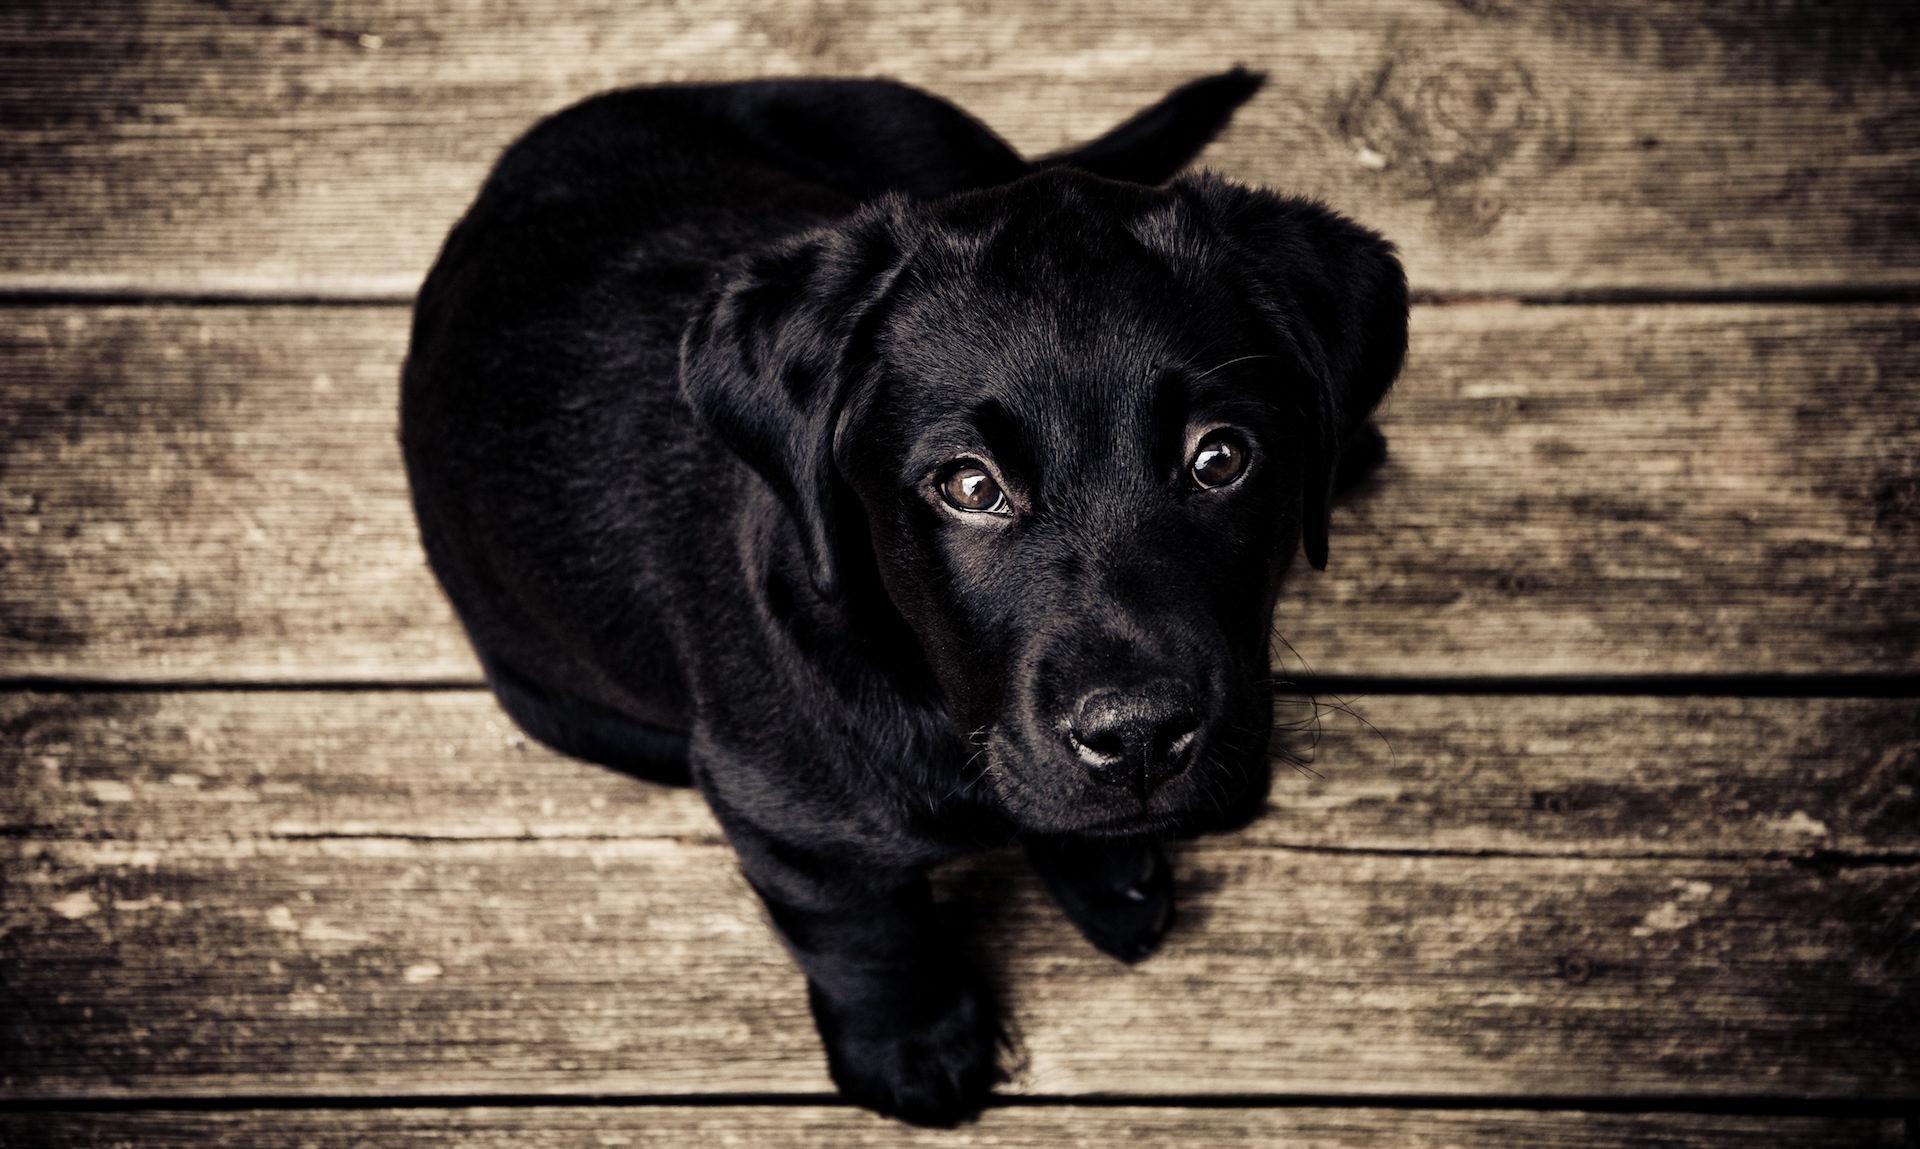 कुत्ता, काले, देखो, आँखें, लकड़ी - HD वॉलपेपर - प्रोफेसर-falken.com